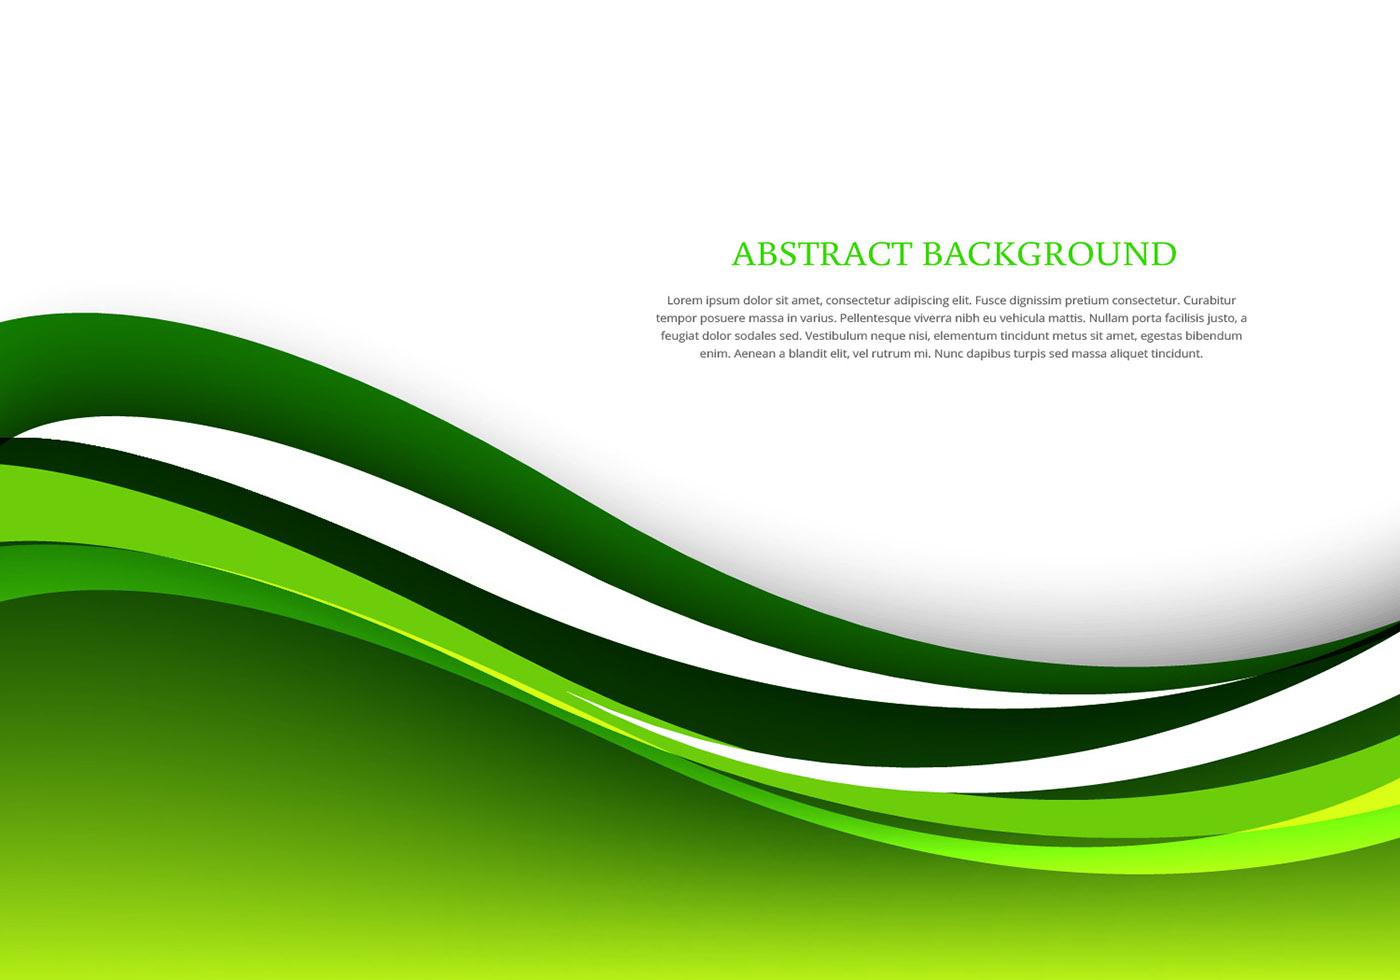 3d Wallpaper For Kitchen Art Green Abstract Background 12762 Hdwpro